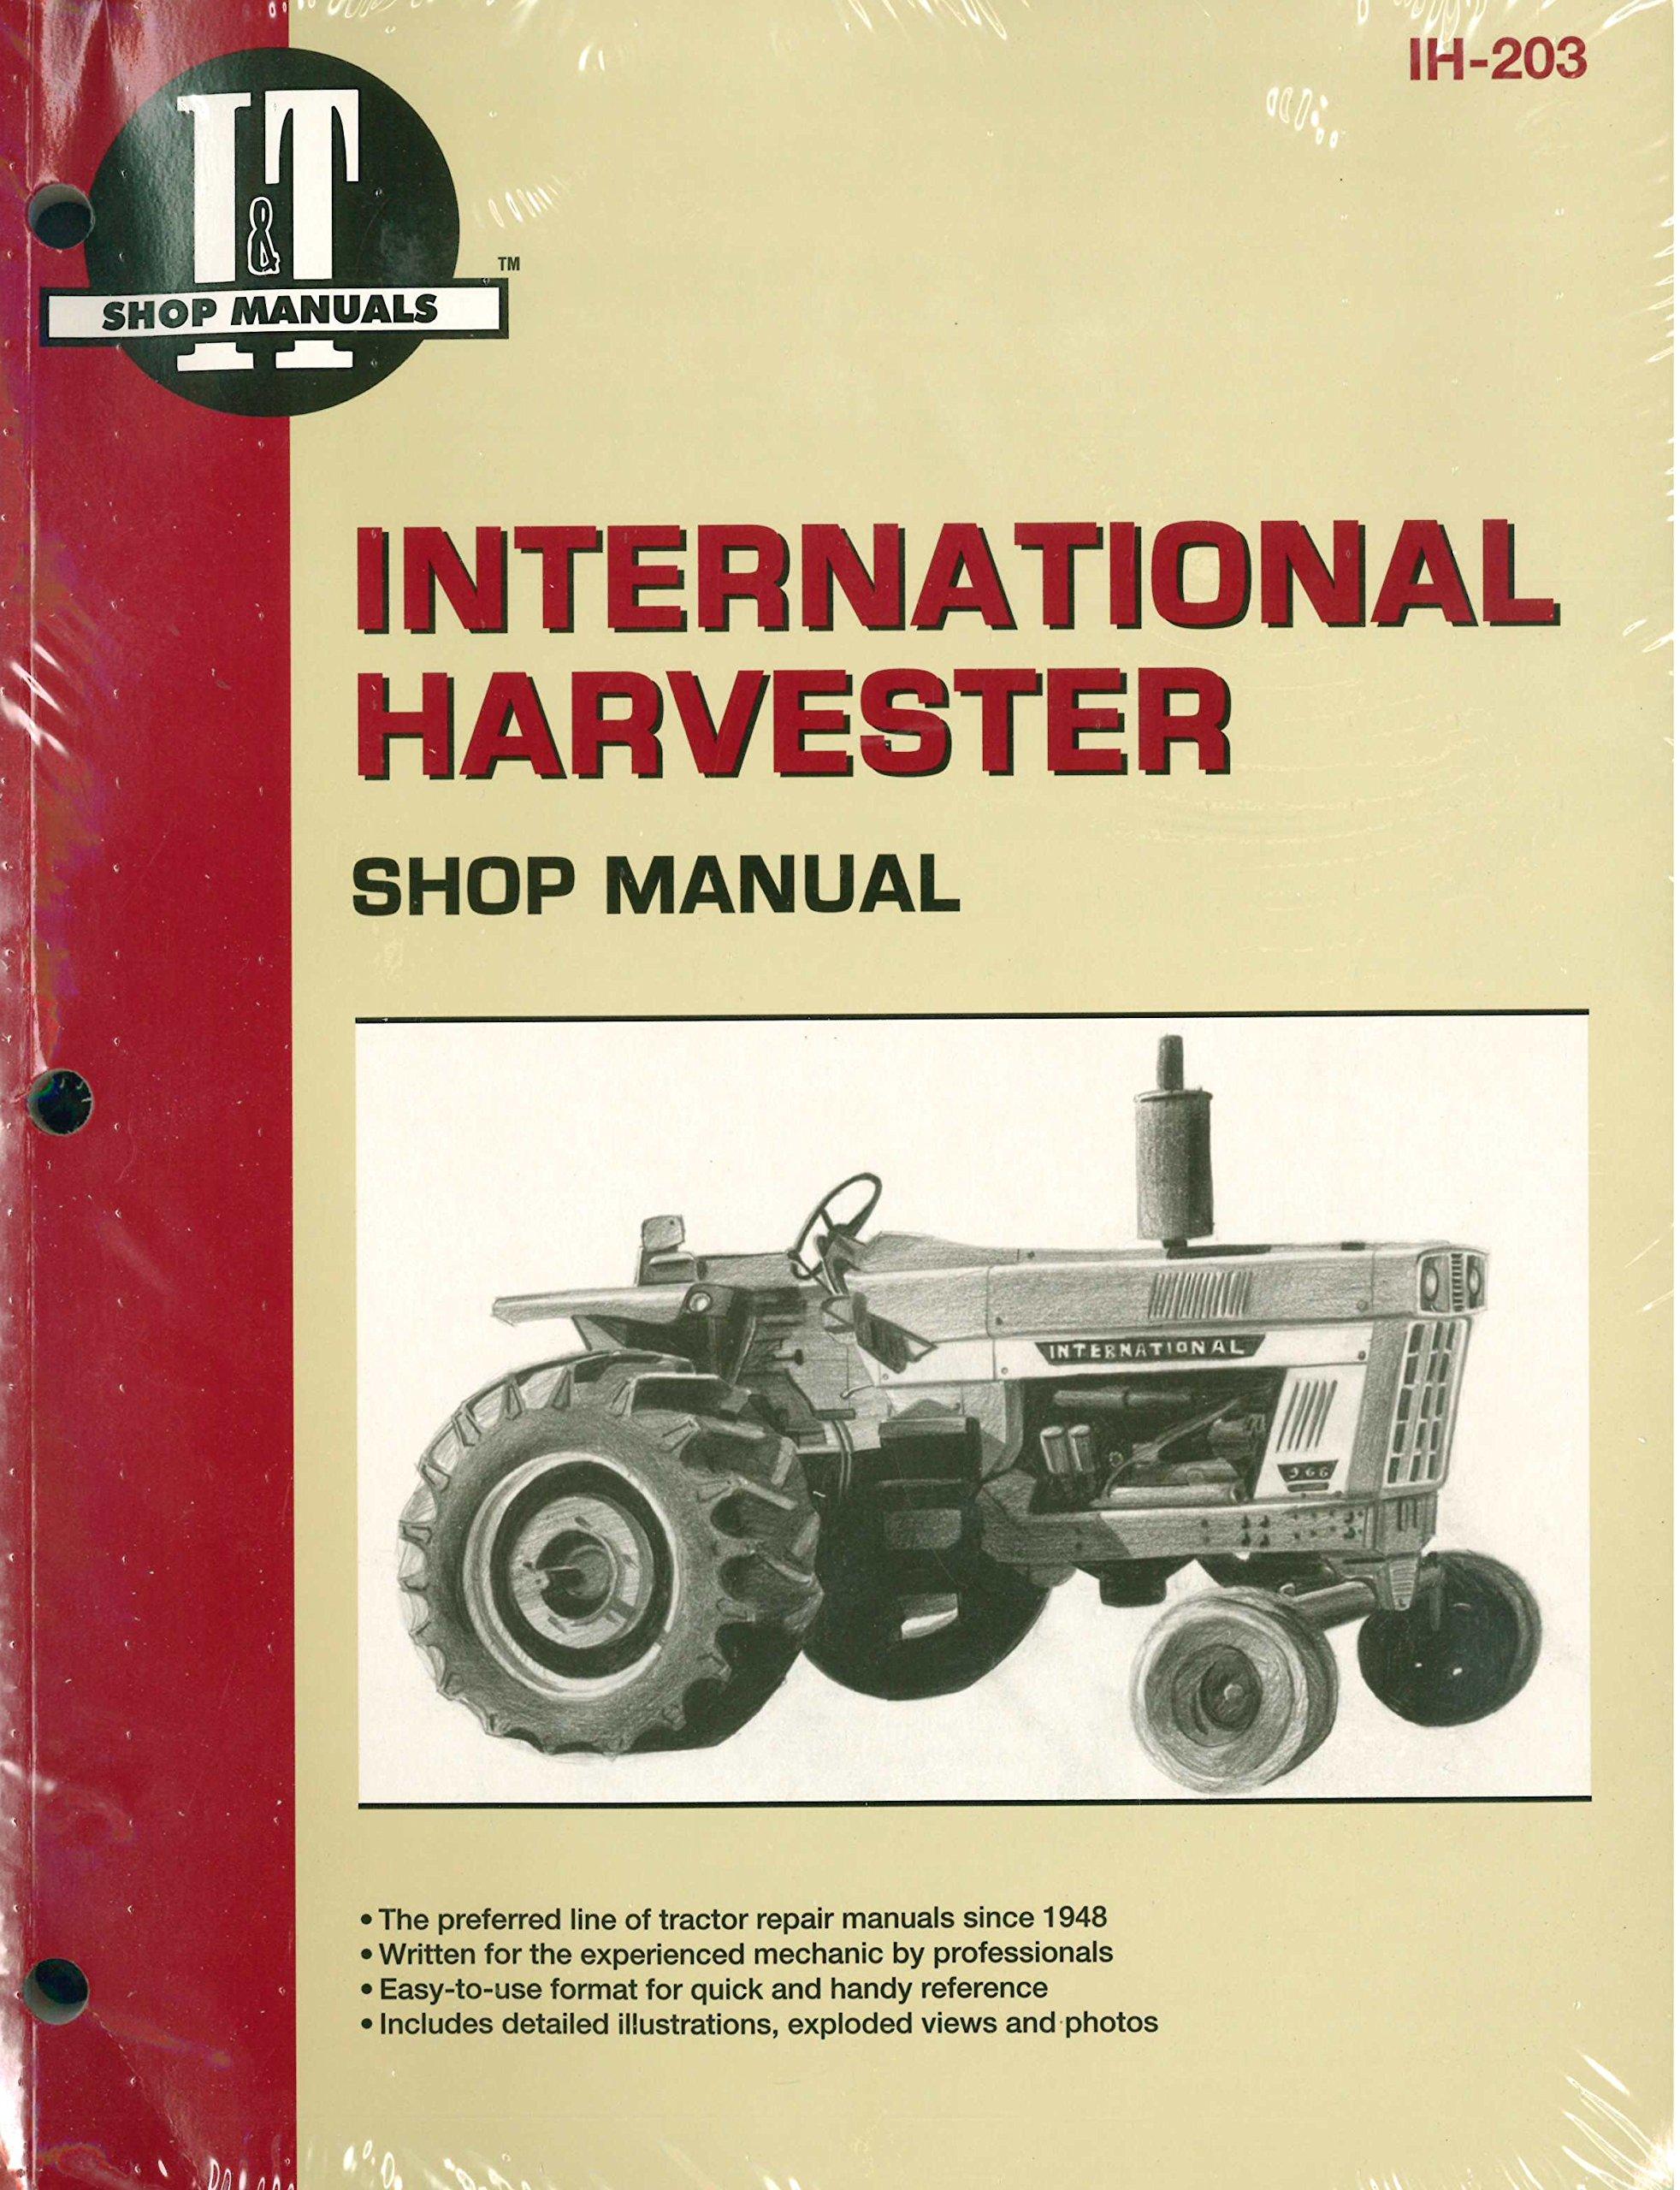 IH-203 International Harvester Tractor Service Manual 454 464 484 574 584  674 766 786 826 886 966 986 1026 1066 1086: Manufacturer: Amazon.com: Books